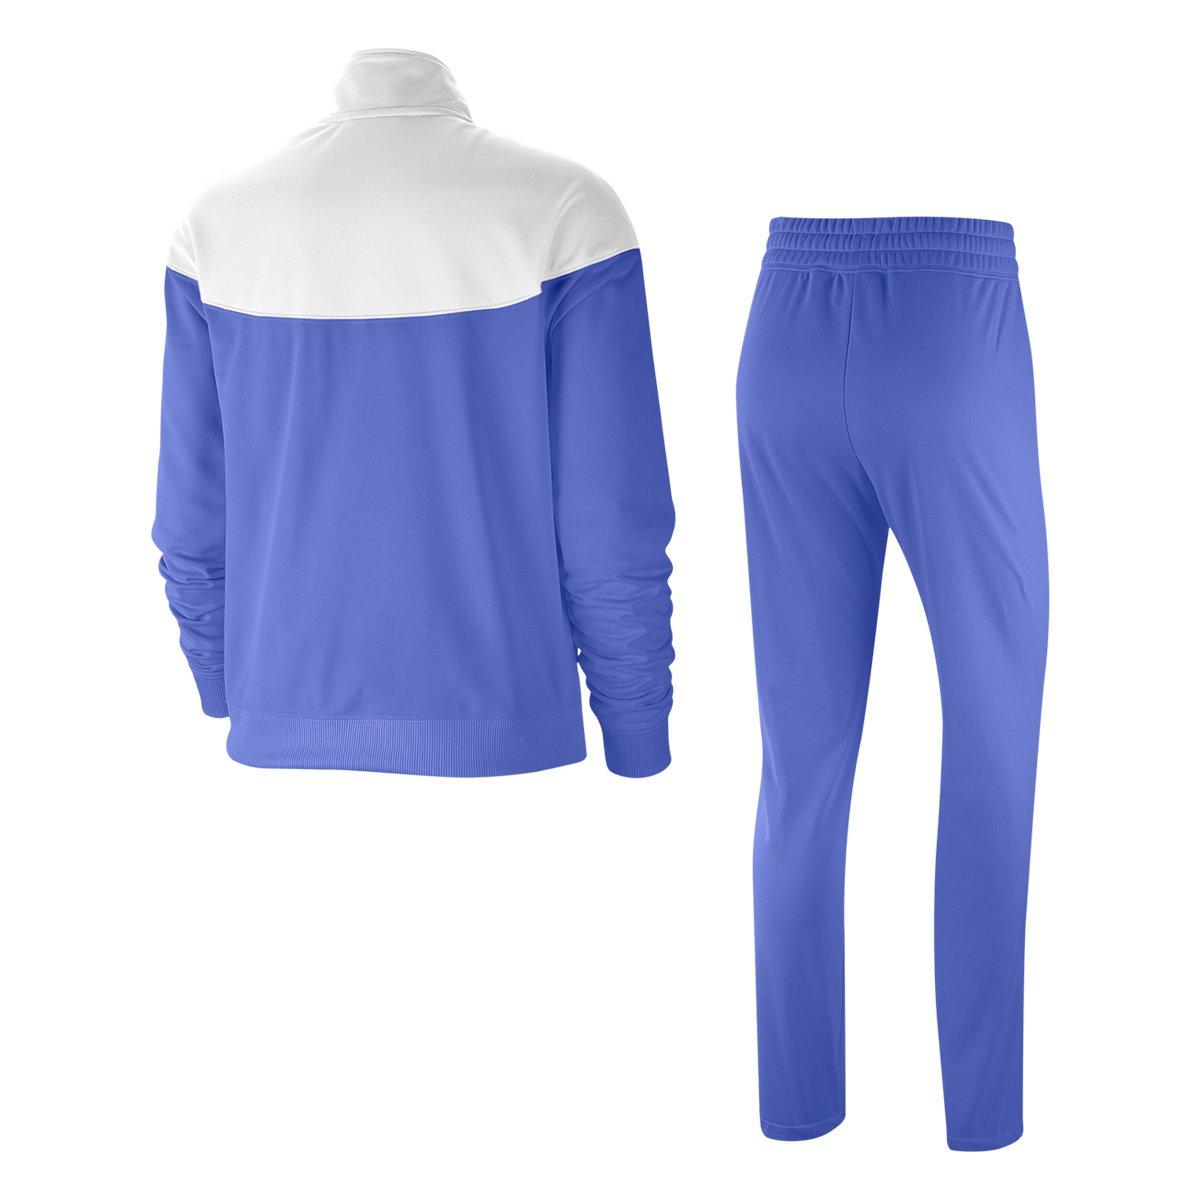 Agasalho Nike Sportswear Feminino  - Ferron Sport